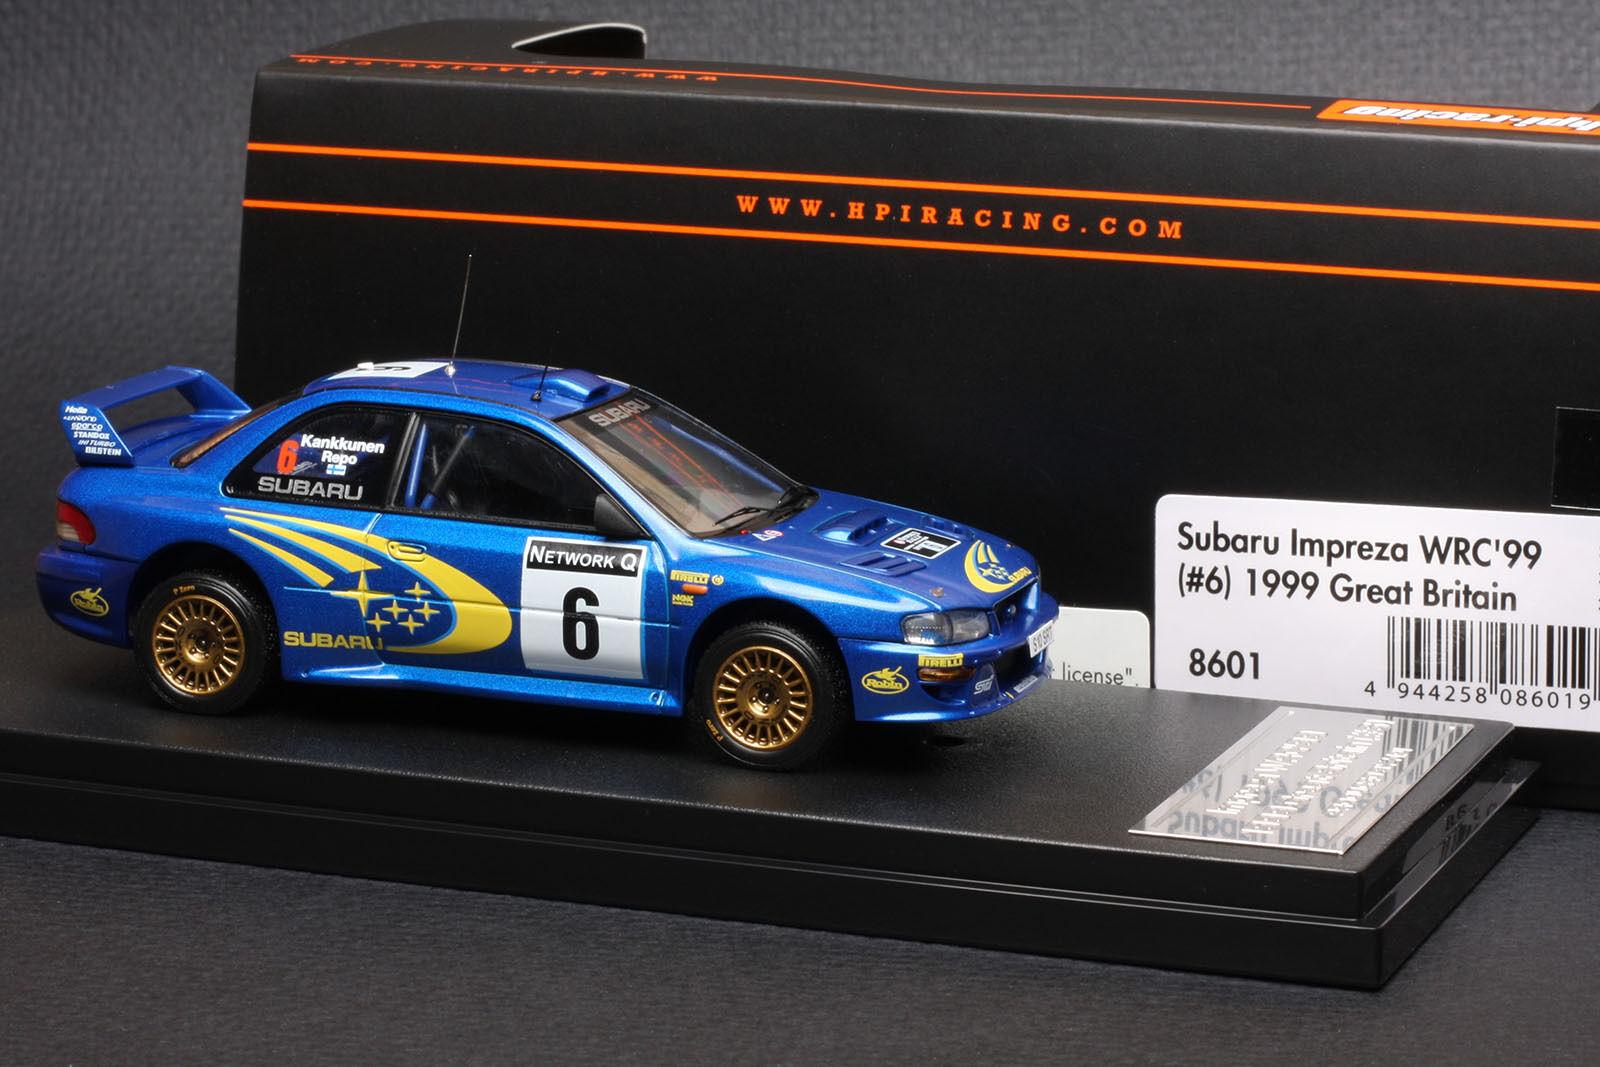 Subaru Impreza  6 1999 Great Britain Rally  Juha Kankkunen  -- HPI  8601 1 43